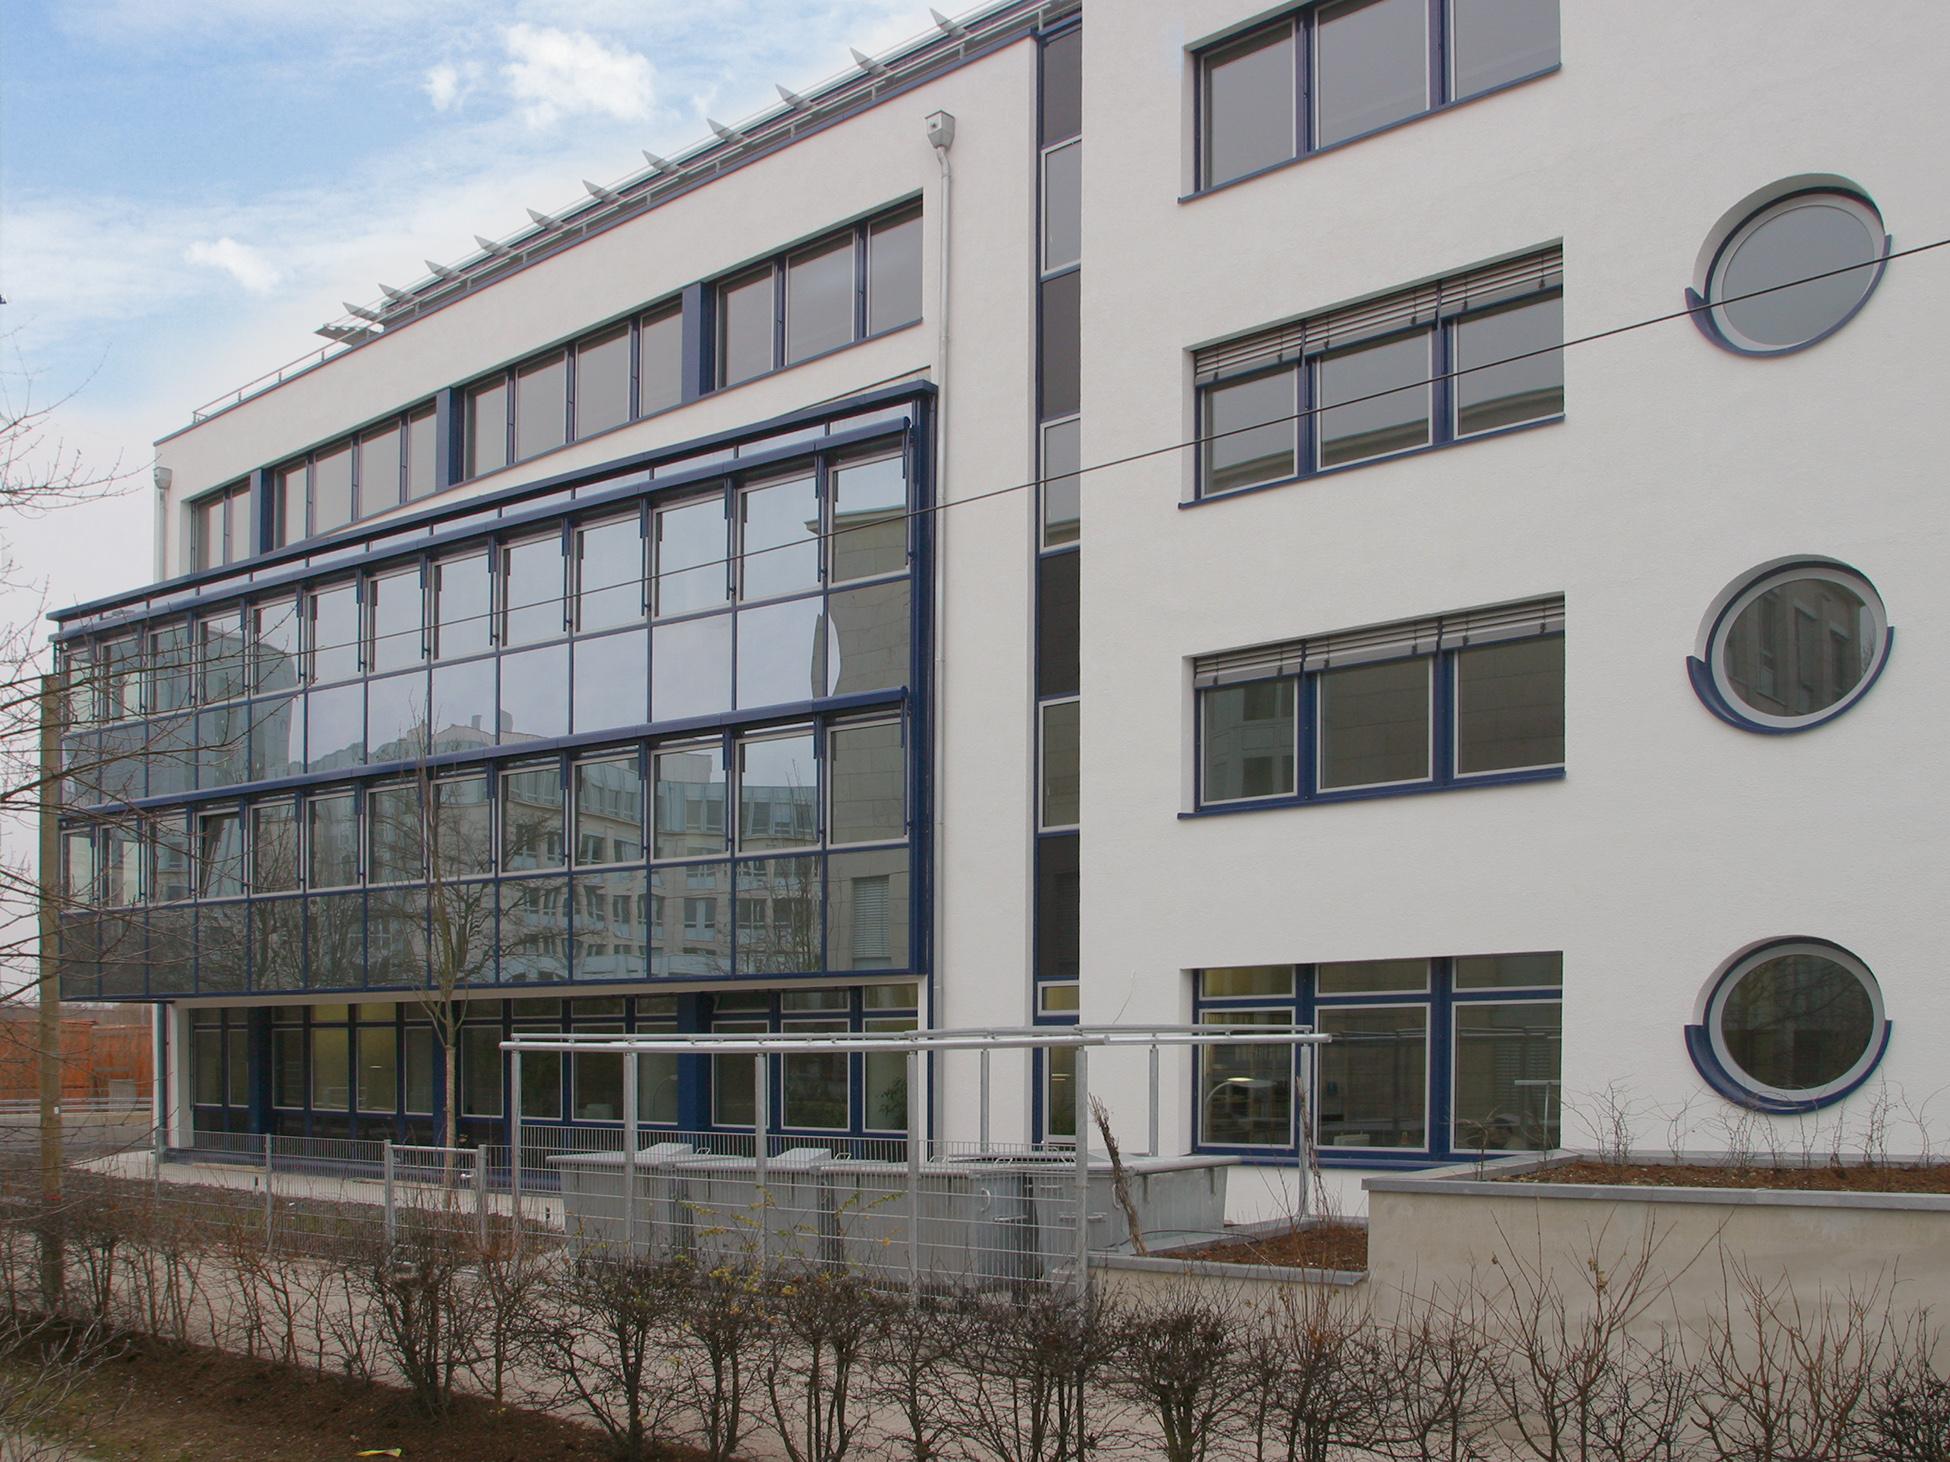 Bürohaus Dillwächter Strasse 5 - München